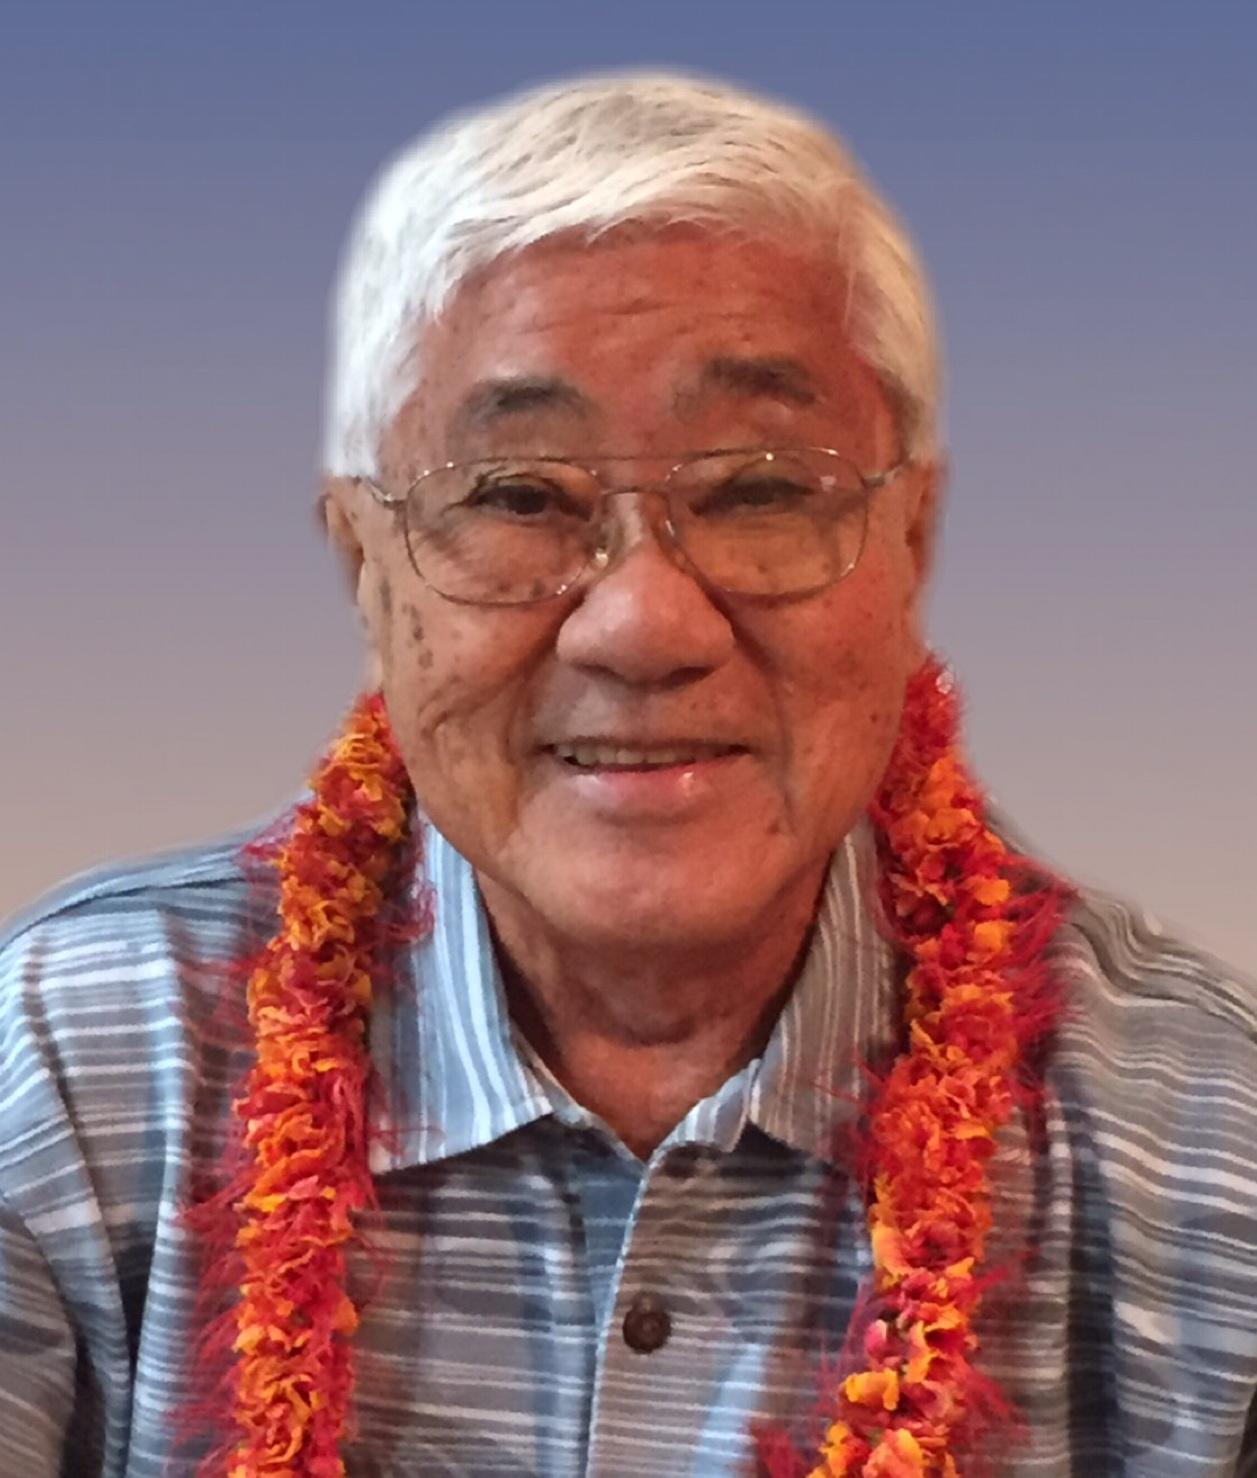 Charles Shin Sato